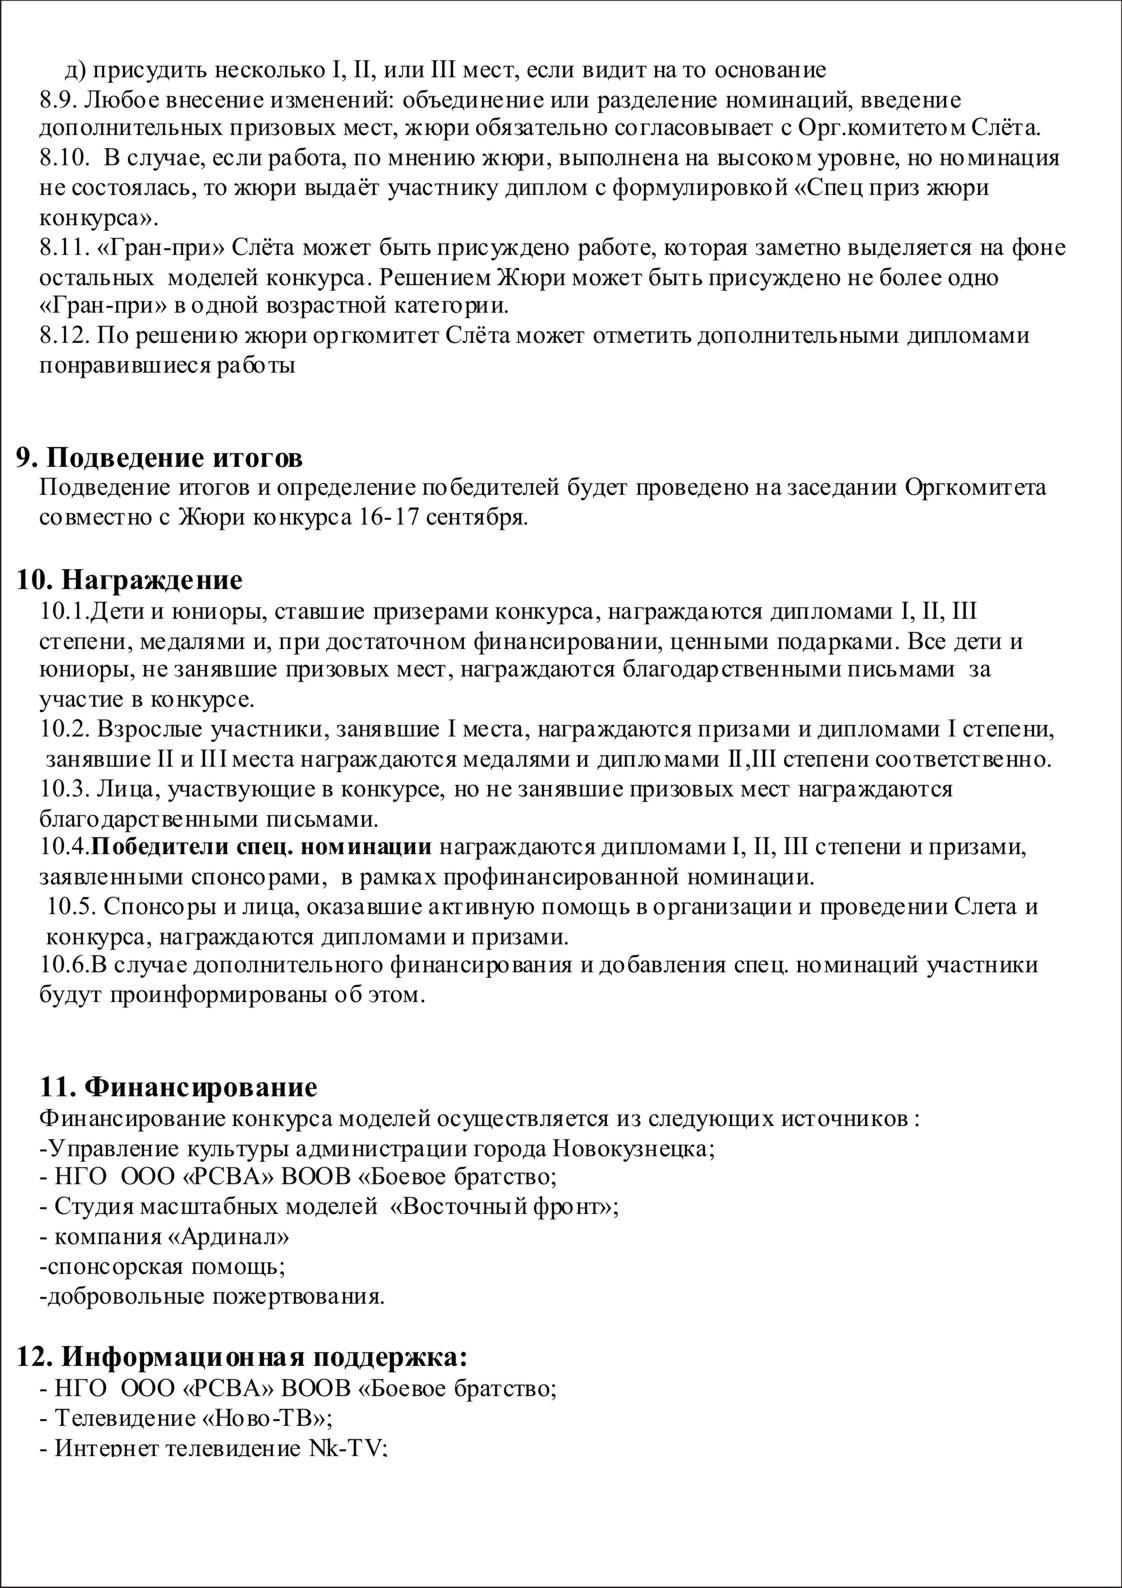 http://s4.uploads.ru/3zFR4.jpg